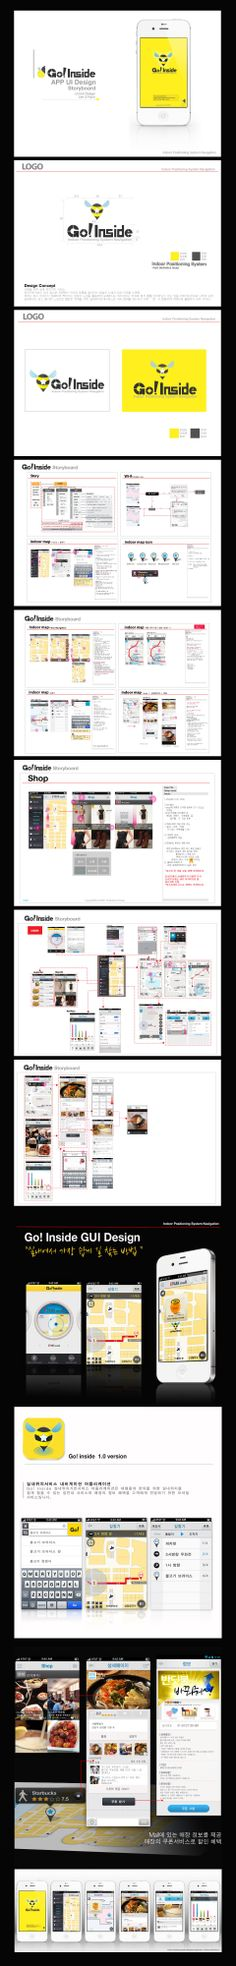 Go! Inside App UI Design Storyboard User Flow, App Ui Design, Interaction Design, Wireframe, Mobile Ui, Ui Ux, Storyboard, Indoor, Icons